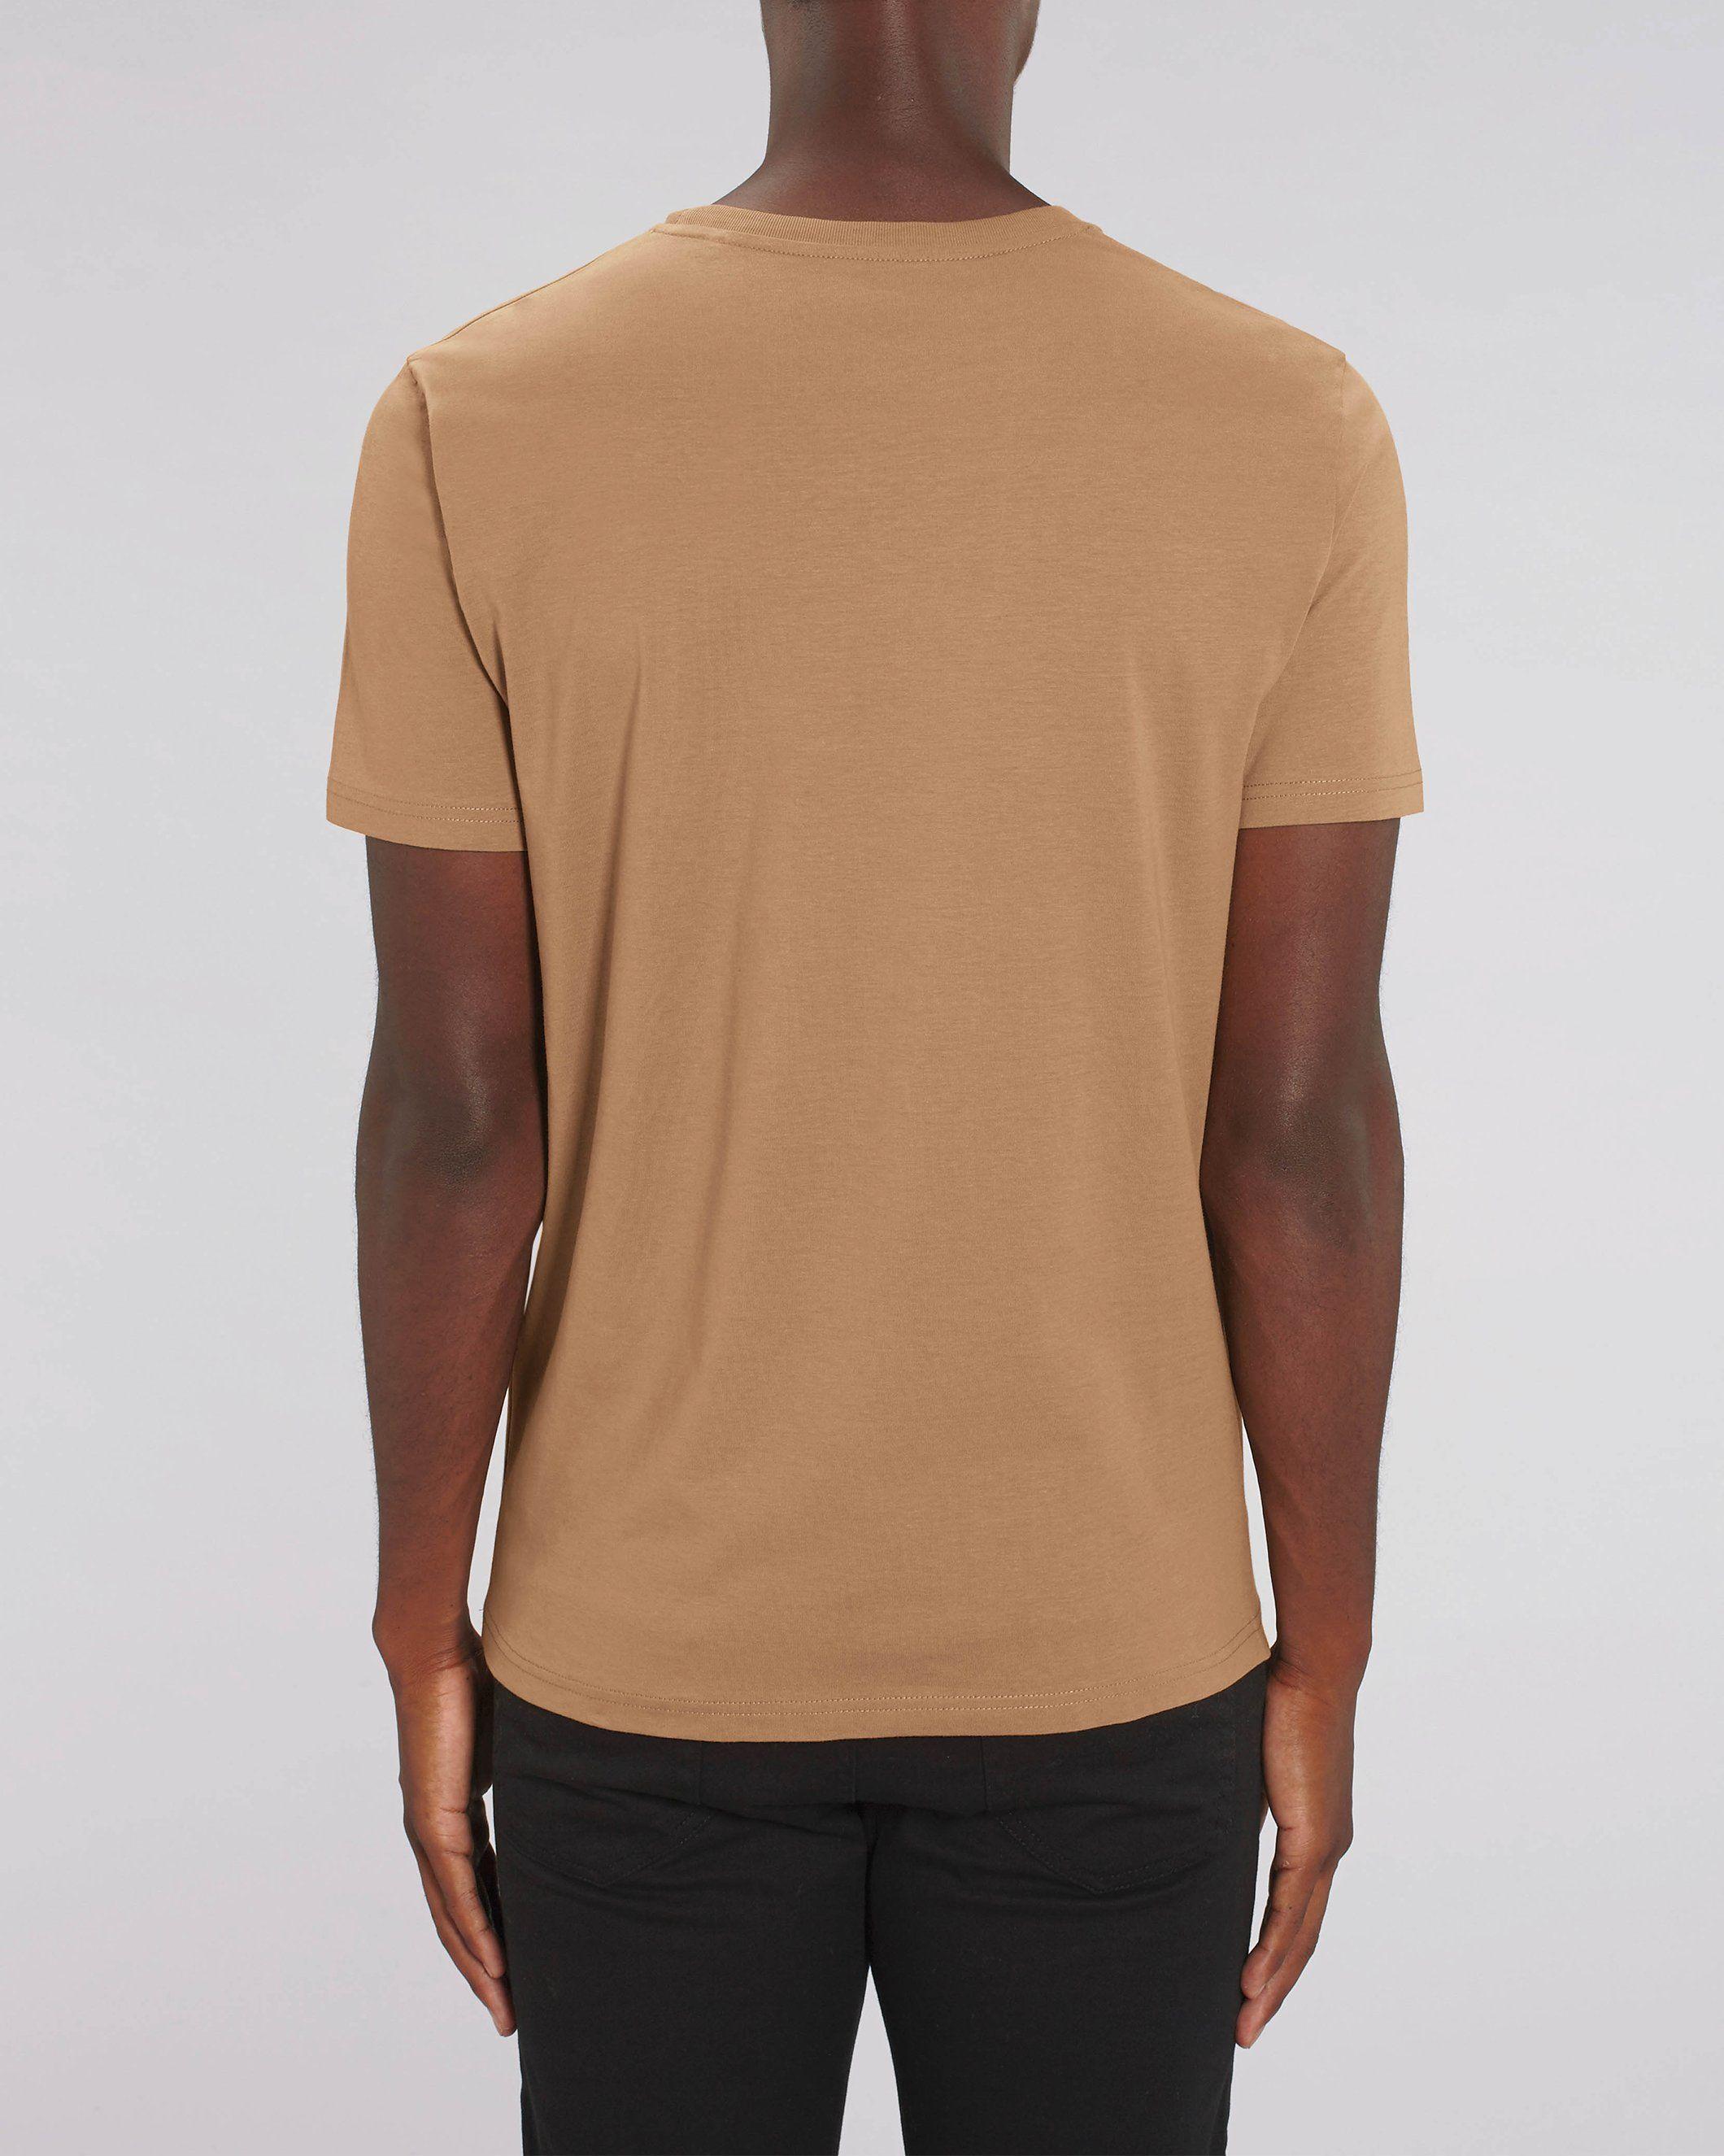 Nauli Unisex Regular Fit T-Shirt in Camel